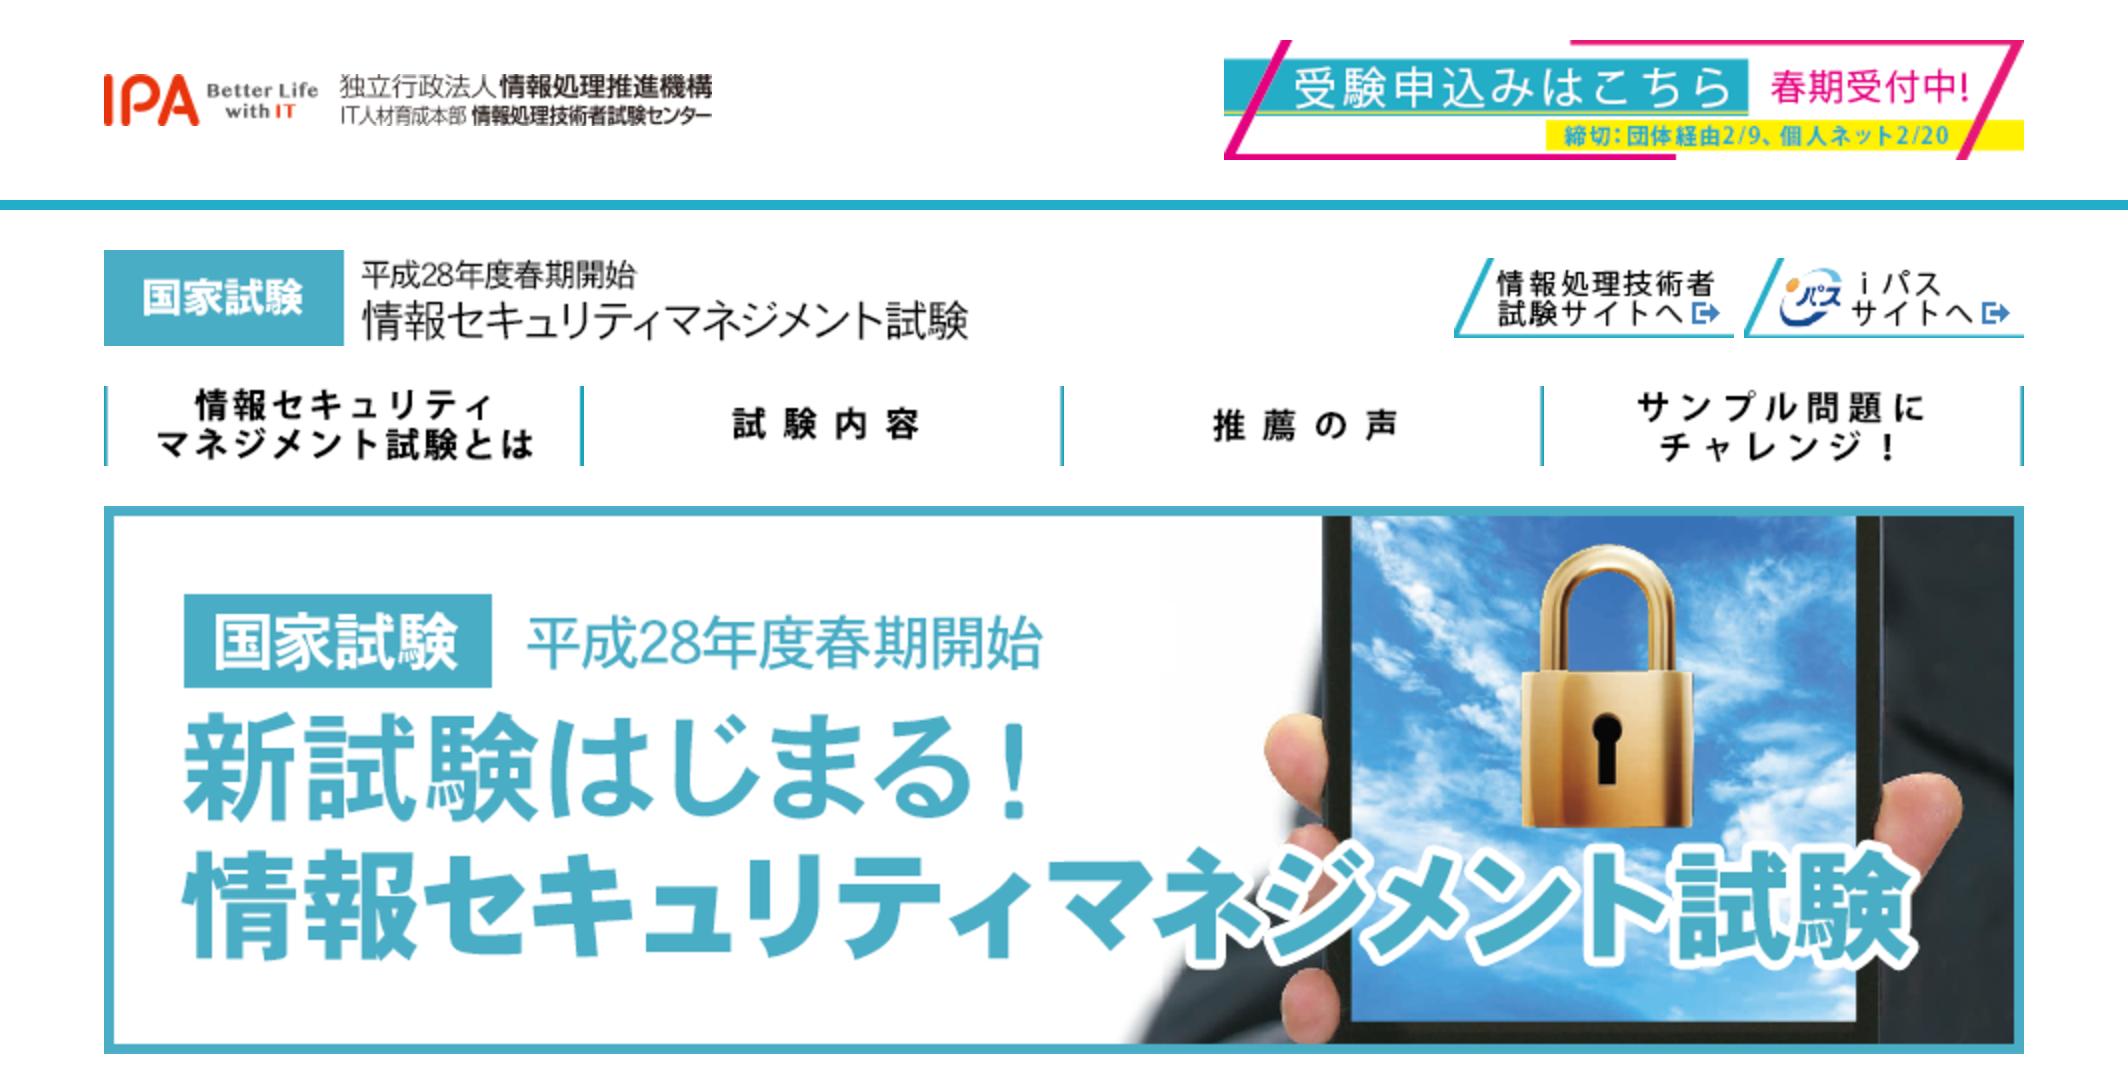 FireShot Capture 232 - 情報セキュリティマネジメント試験 平成28年度春期開始 - https___www.jitec.ipa.go.jp_sg_index.html